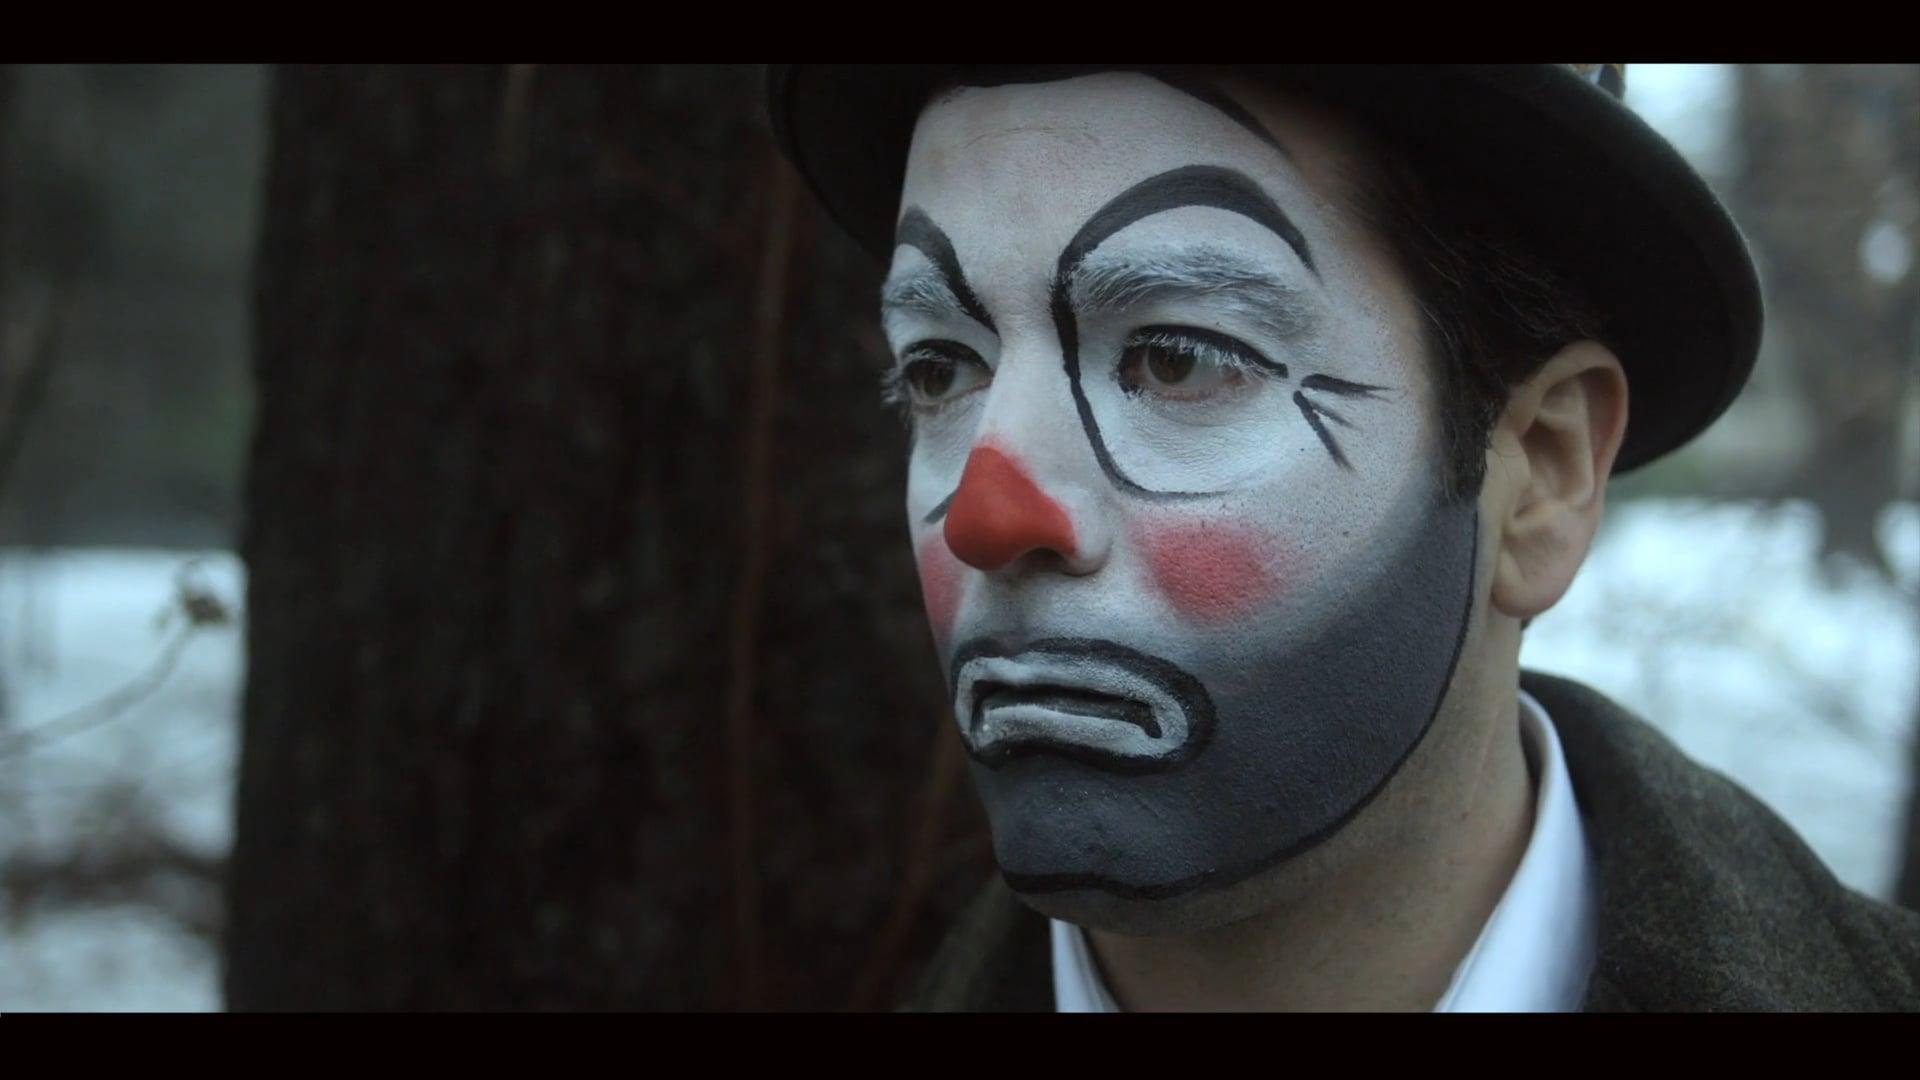 Dramatic scene from: MAVERICKS (2015) - Featuring William Galatis